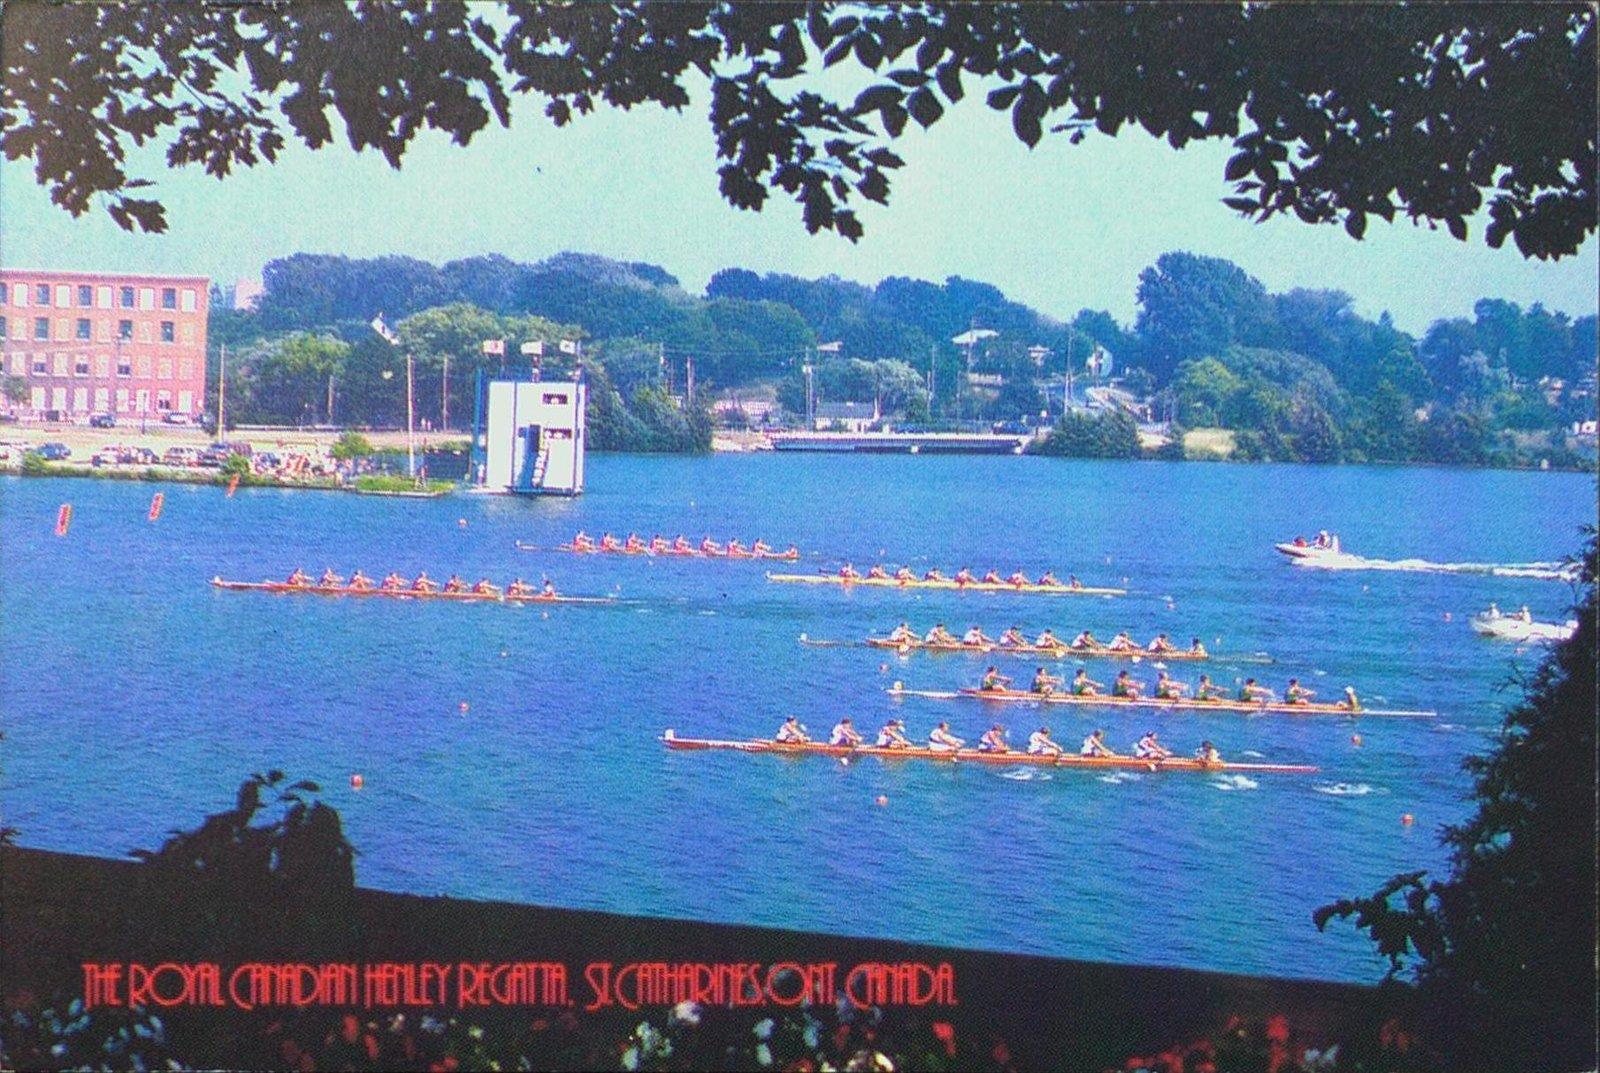 The Royal Canadian Henley Regatta